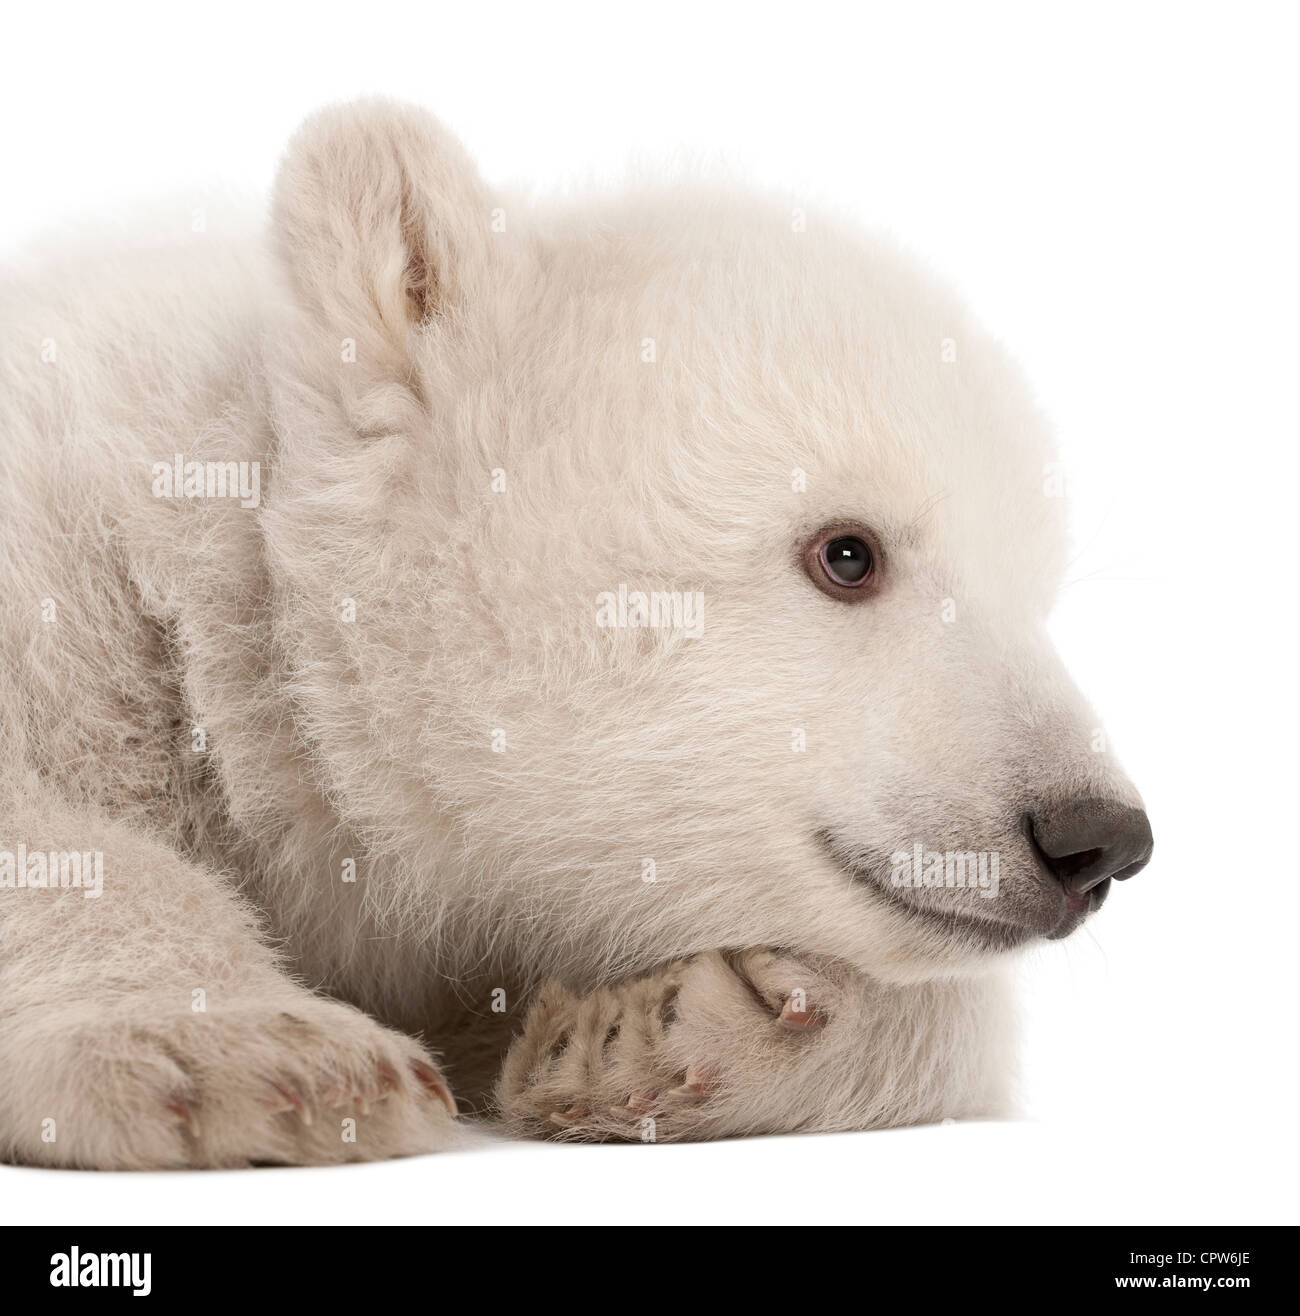 Polar bear cub,  Ursus maritimus, 3 months old against white background Stock Photo